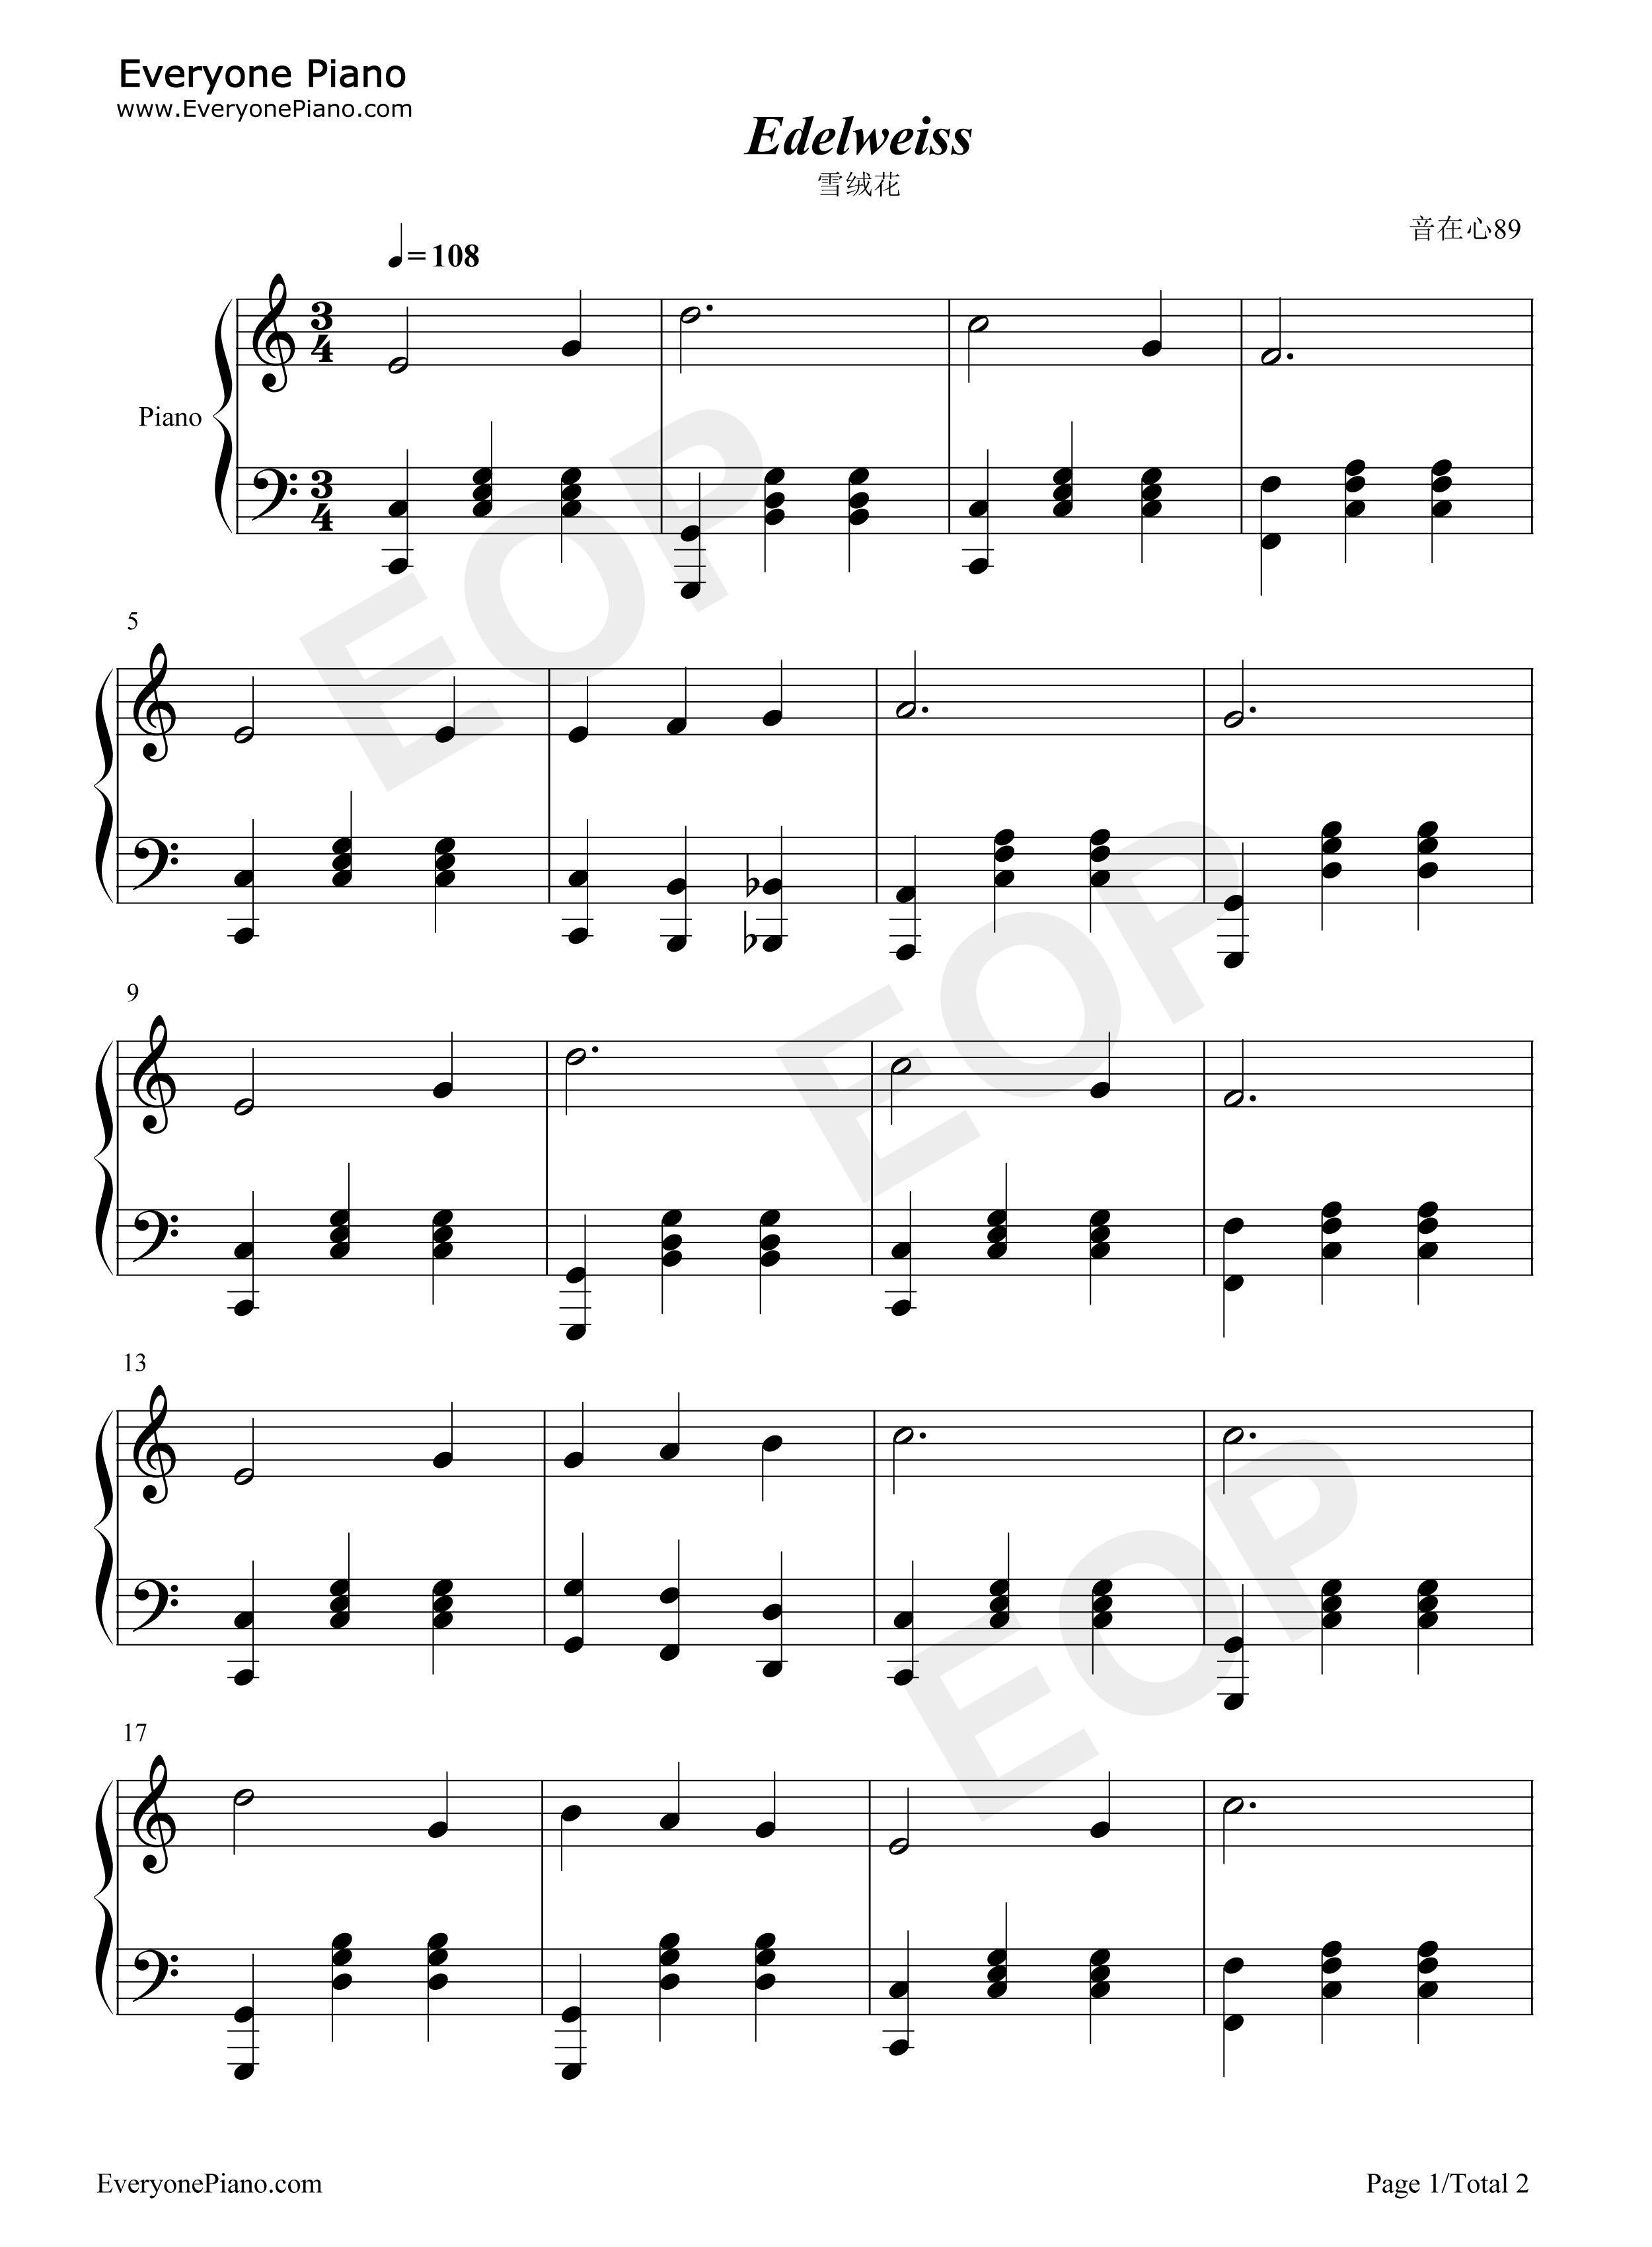 Edelweiss  Rodgers amp Hammerstein  Lyrics amp Chords